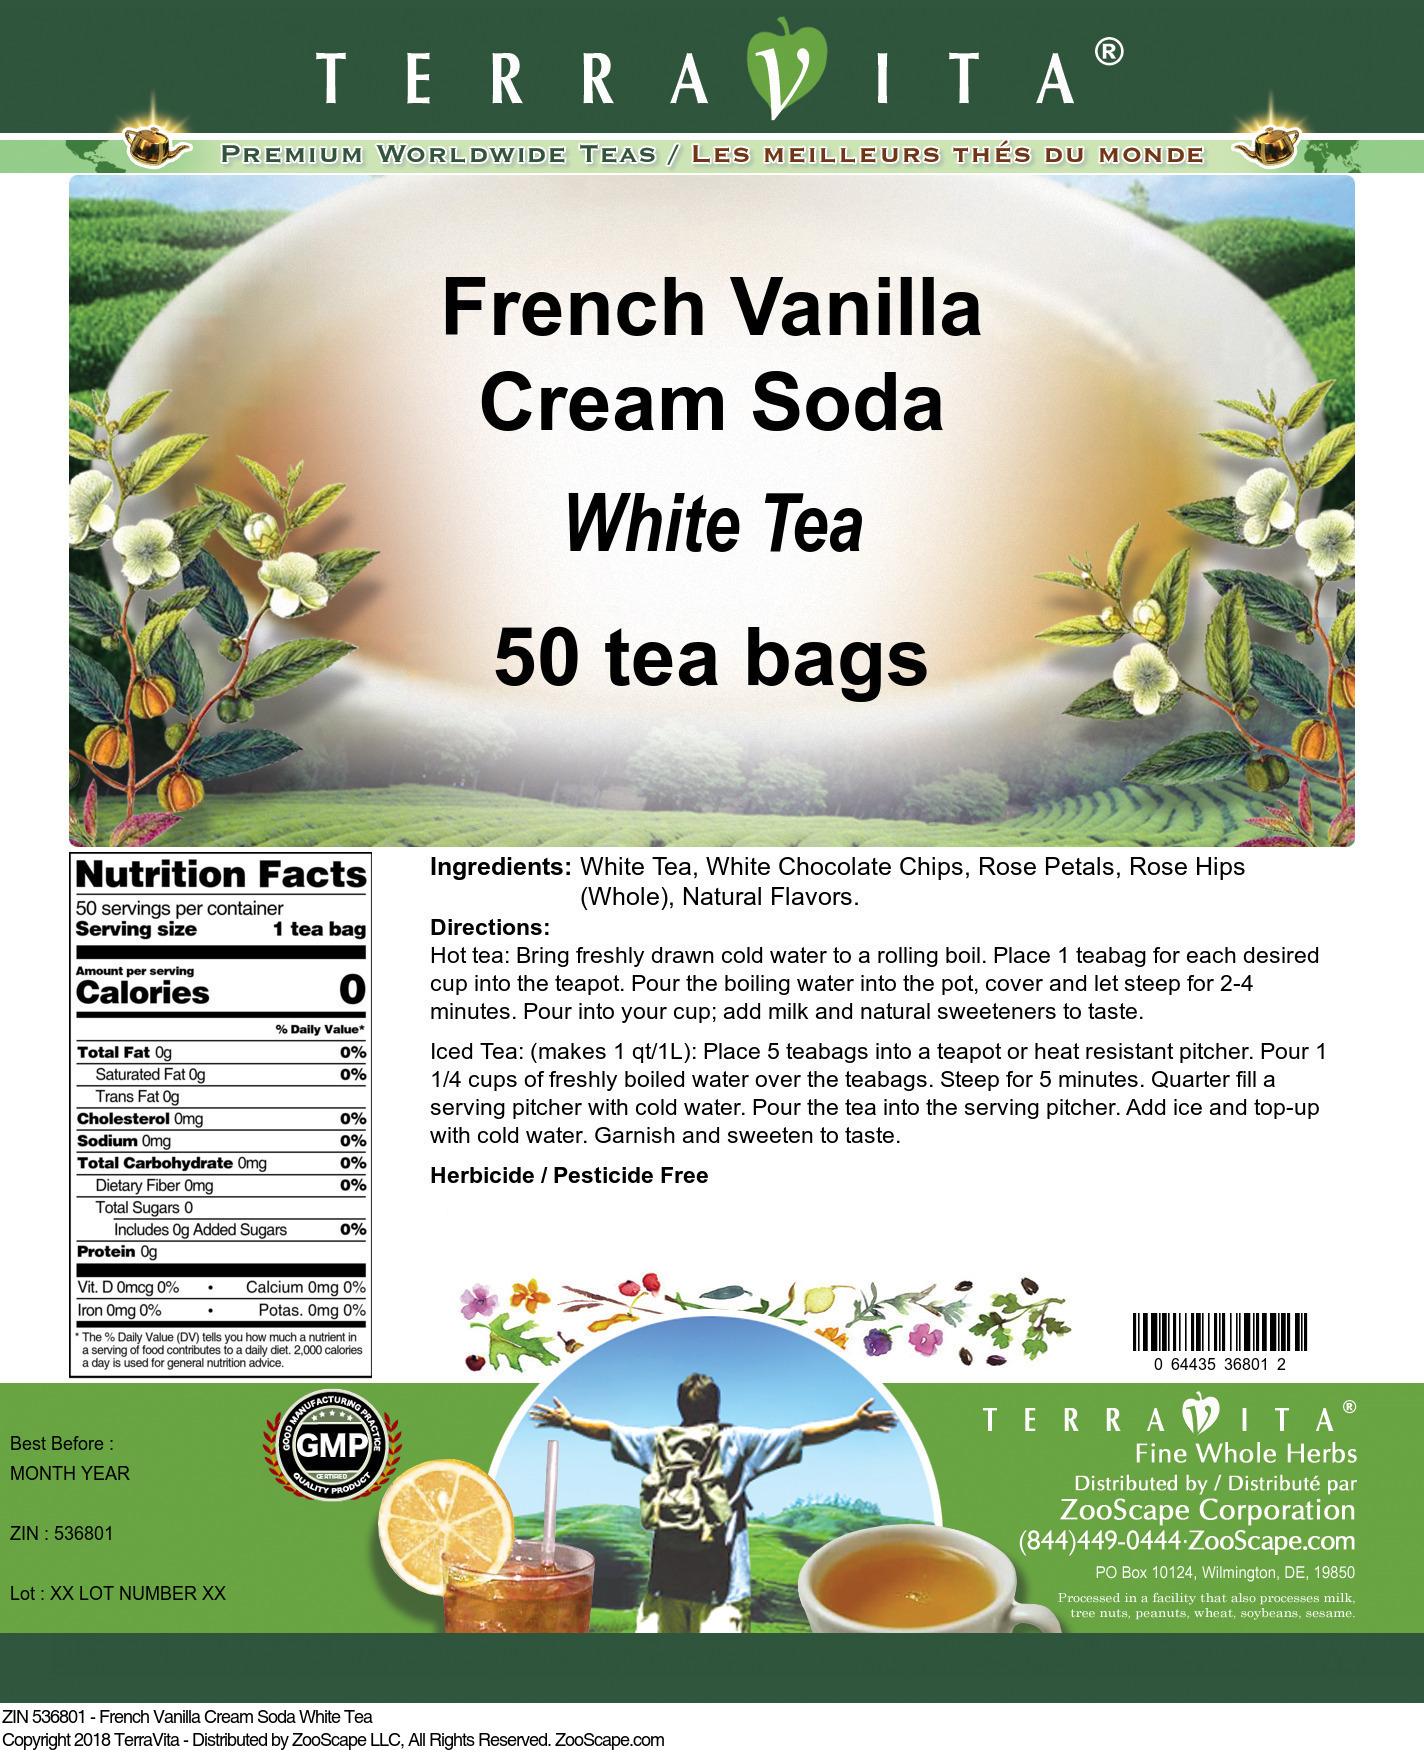 French Vanilla Cream Soda White Tea